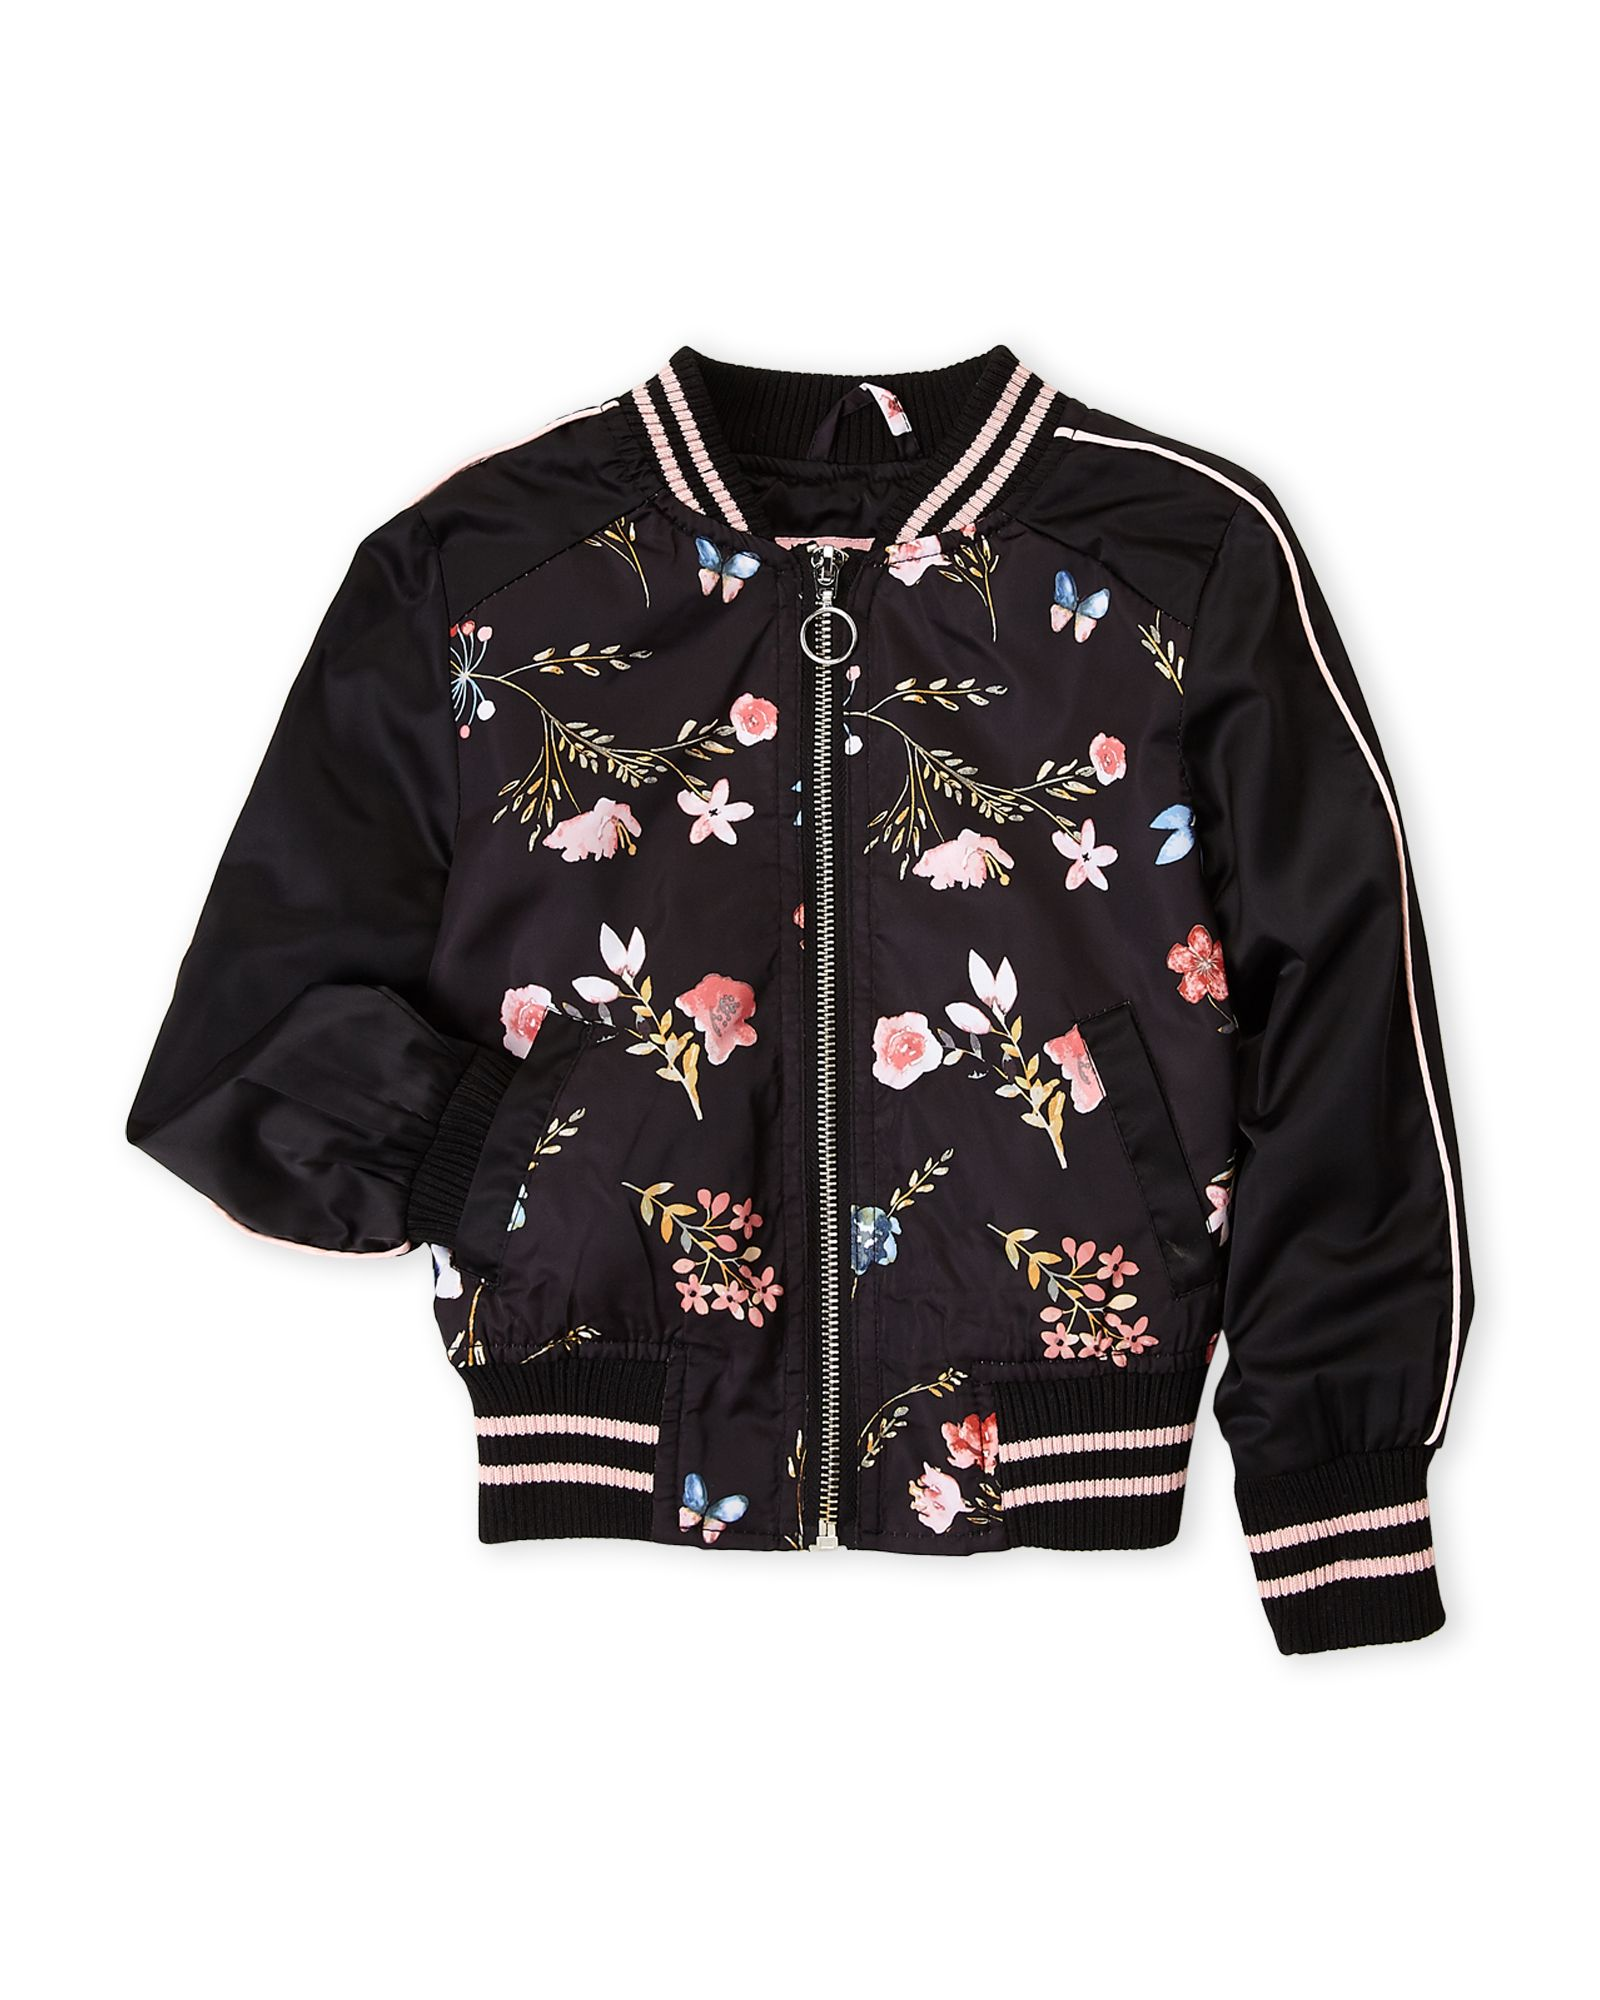 Girls 7 16) Black Floral Sateen Bomber Jacket | Bomber